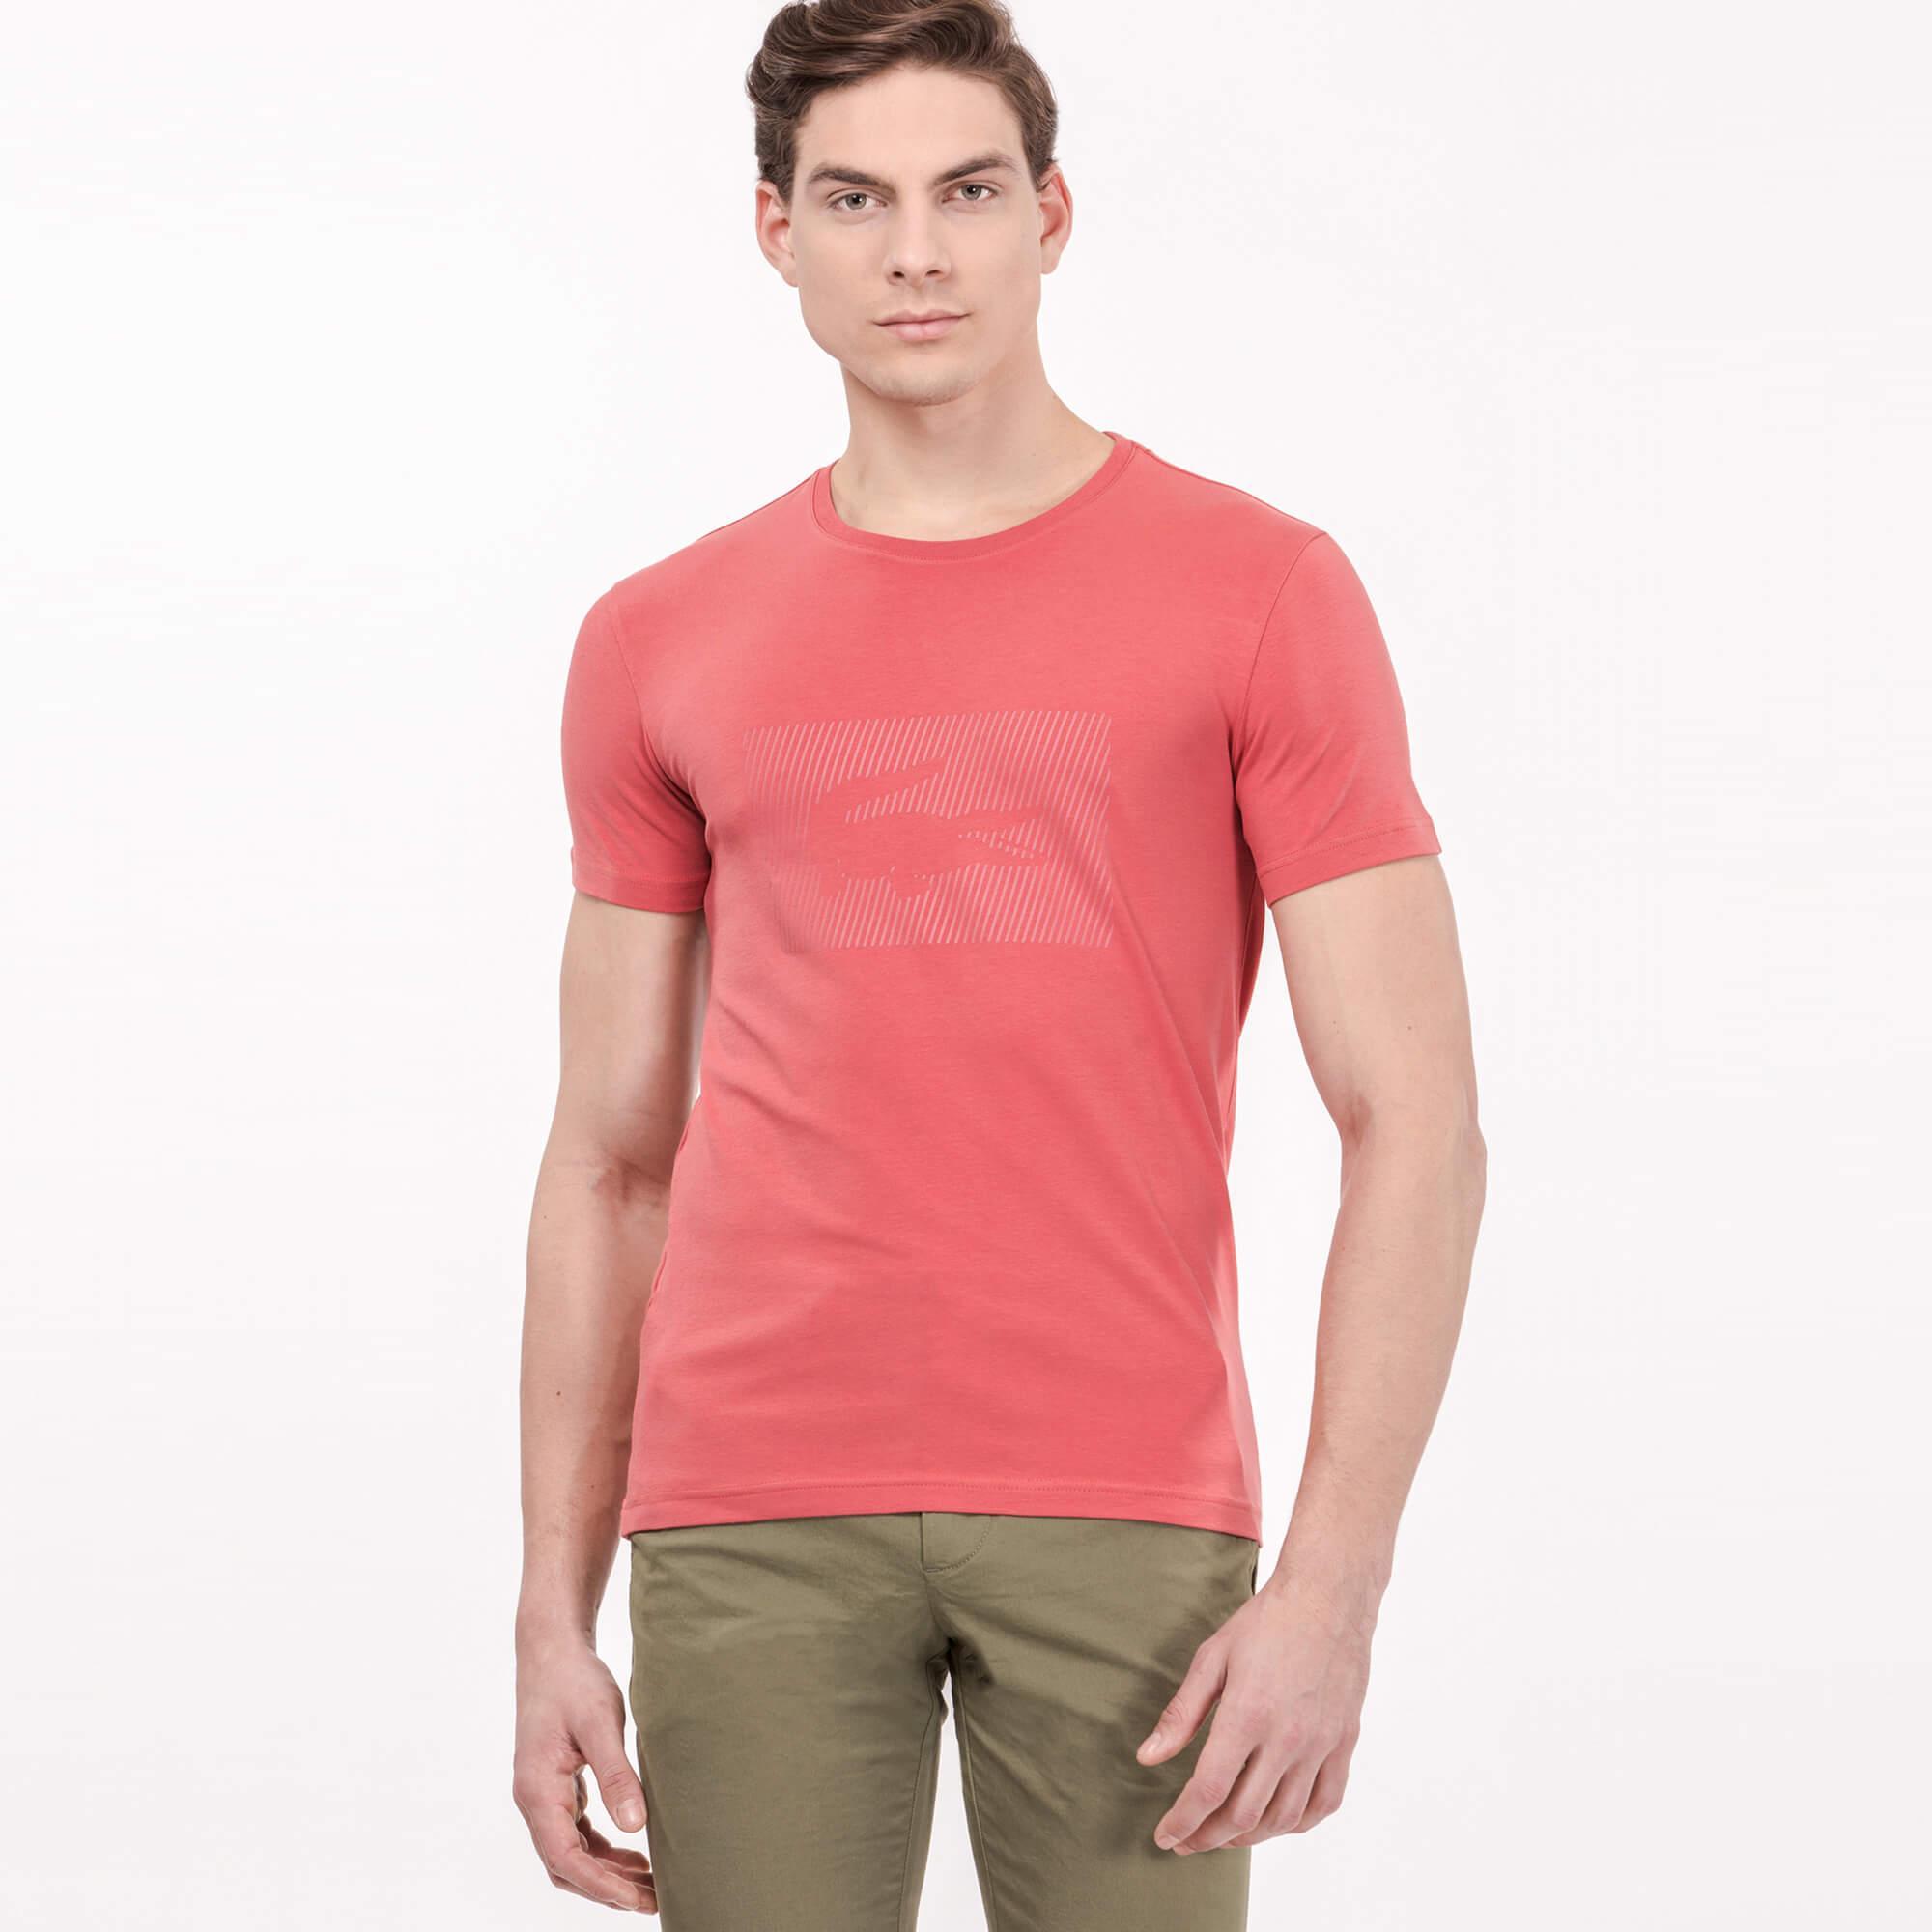 Lacoste Erkek Slim Fit Pembe T-Shirt